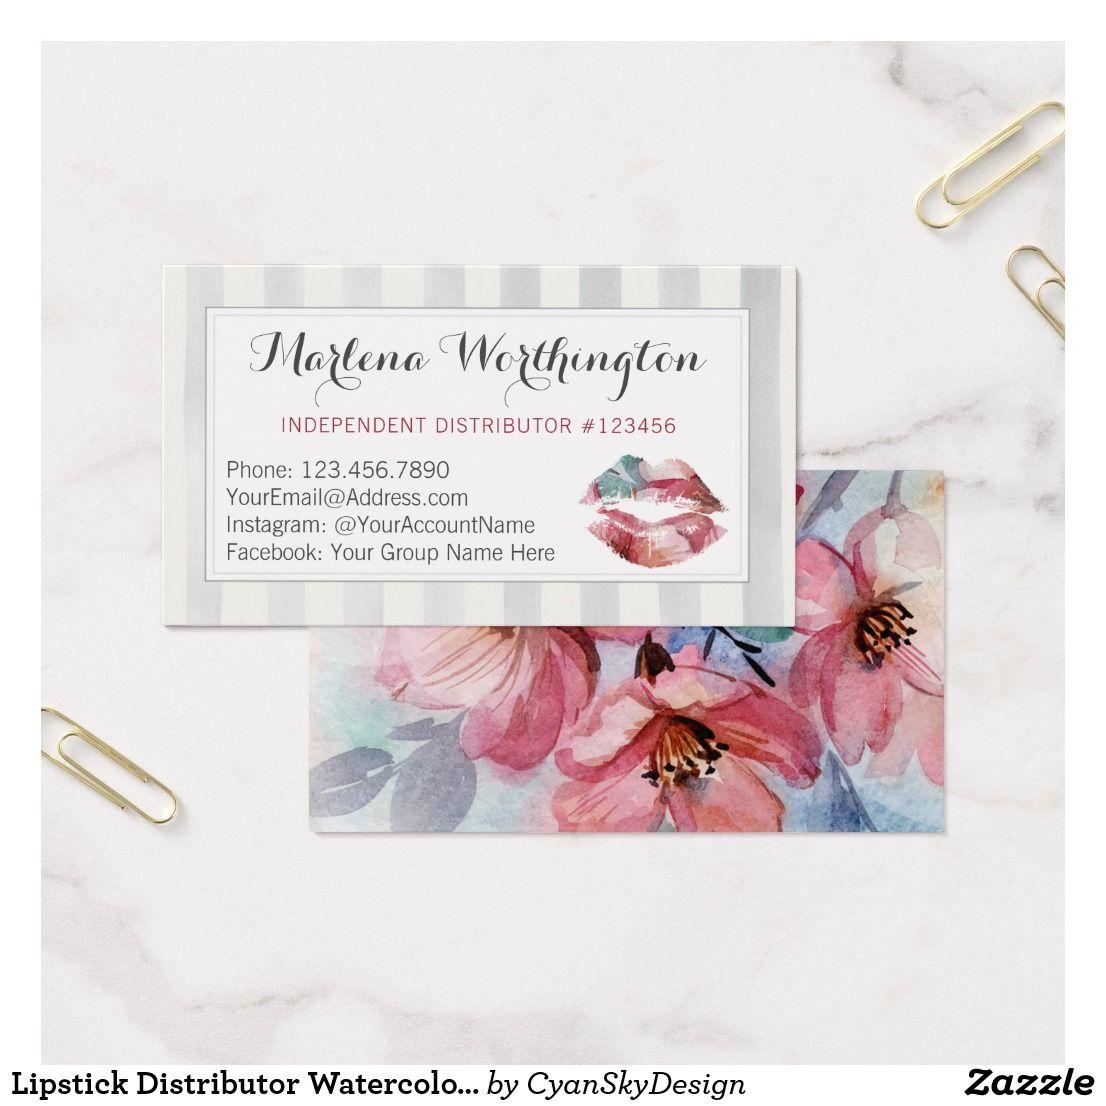 Lipstick Distributor Watercolor Kiss Plain Back Business Card